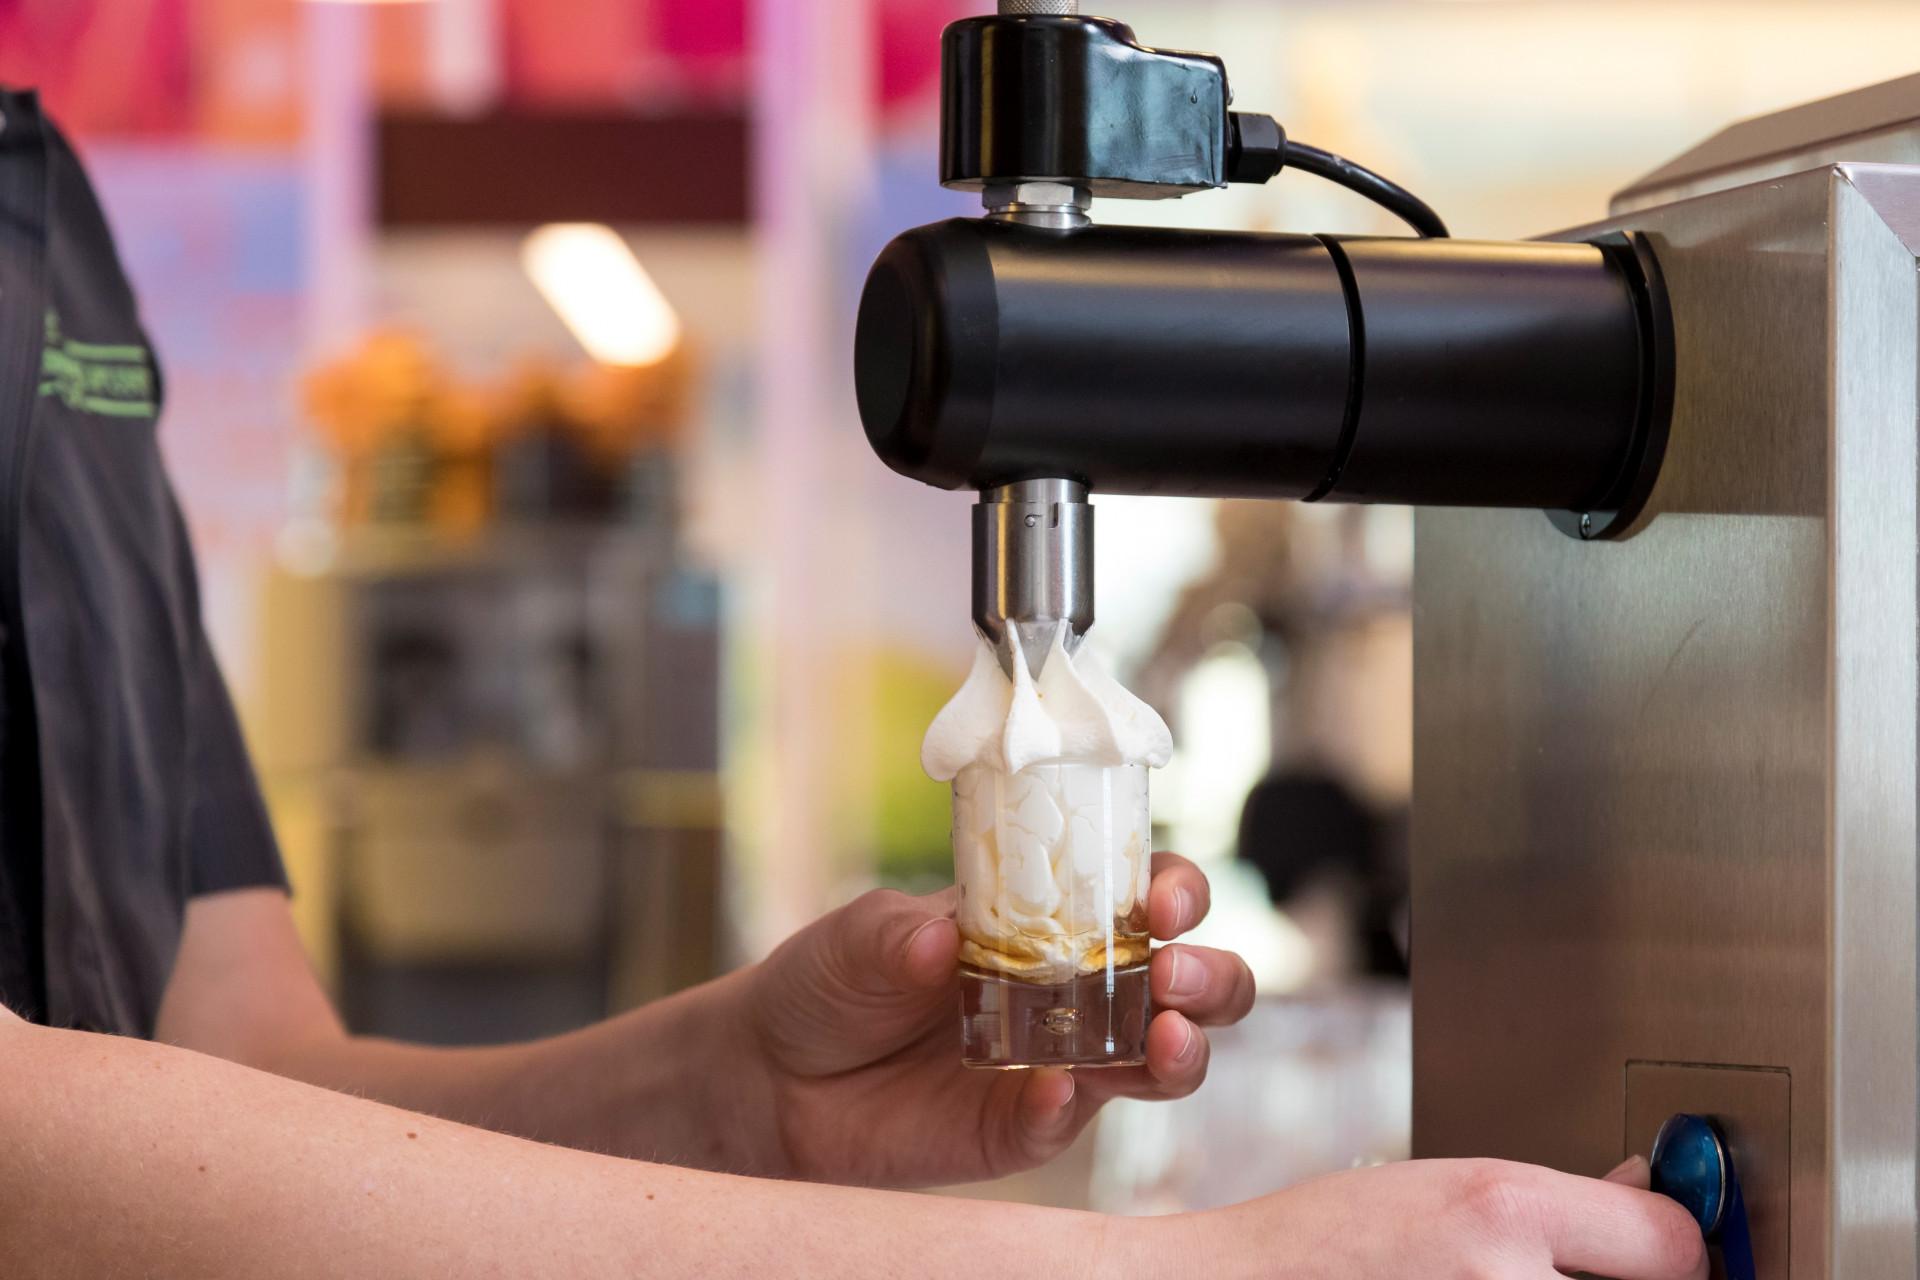 Sanomat slagroommachine